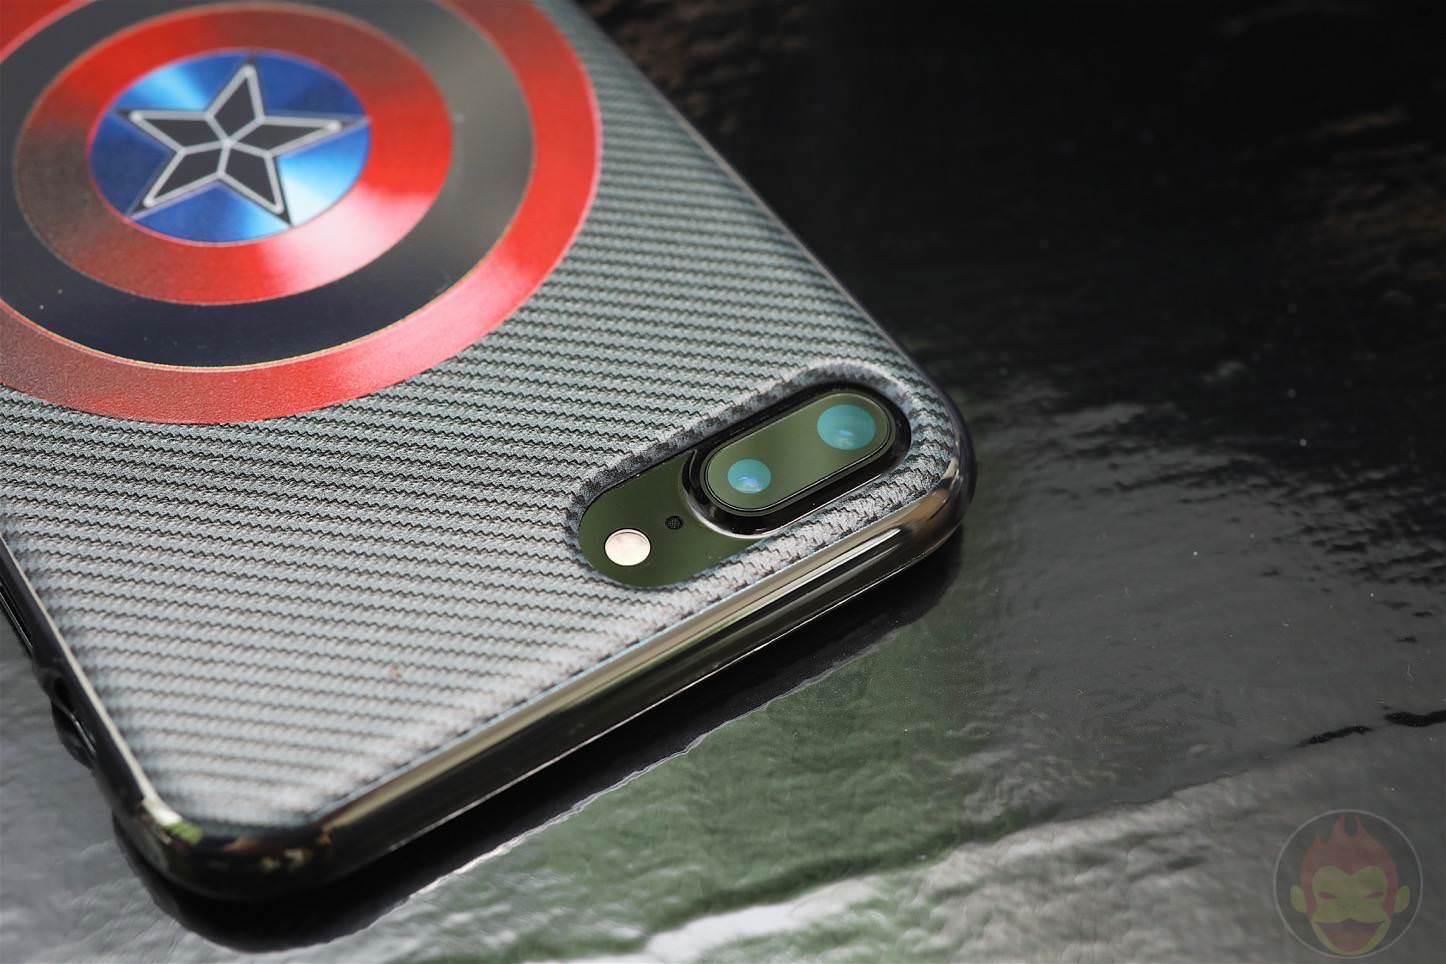 MARVEL-Design-iPhone-7-Plus-Case-and-Ring-03.jpg